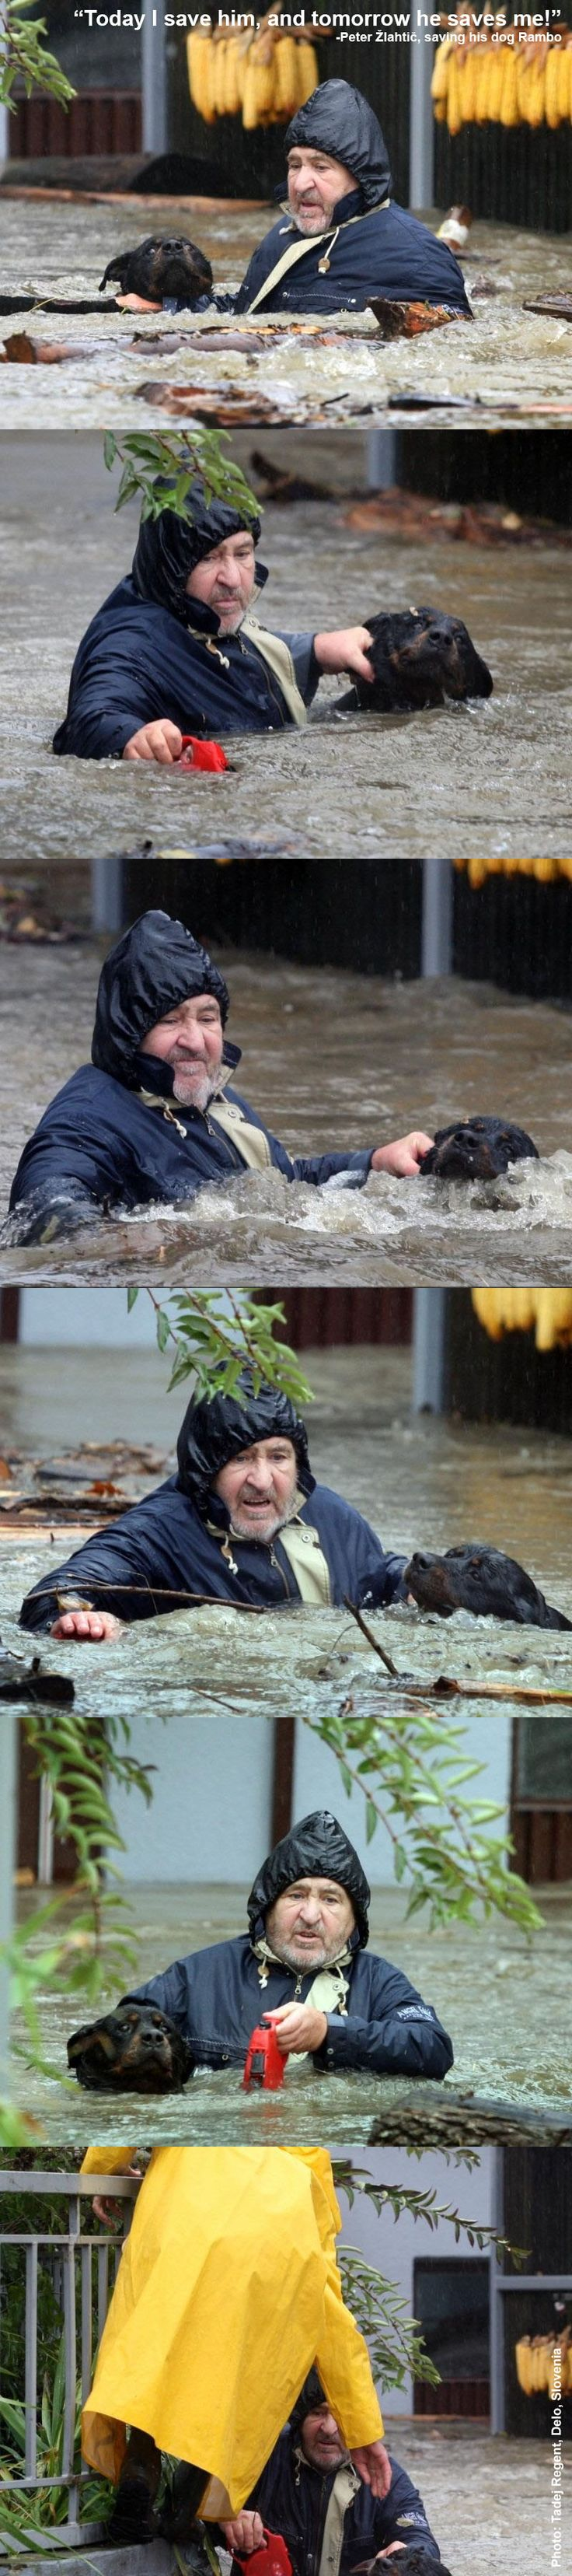 Recent floods in Slovenia - Imgur